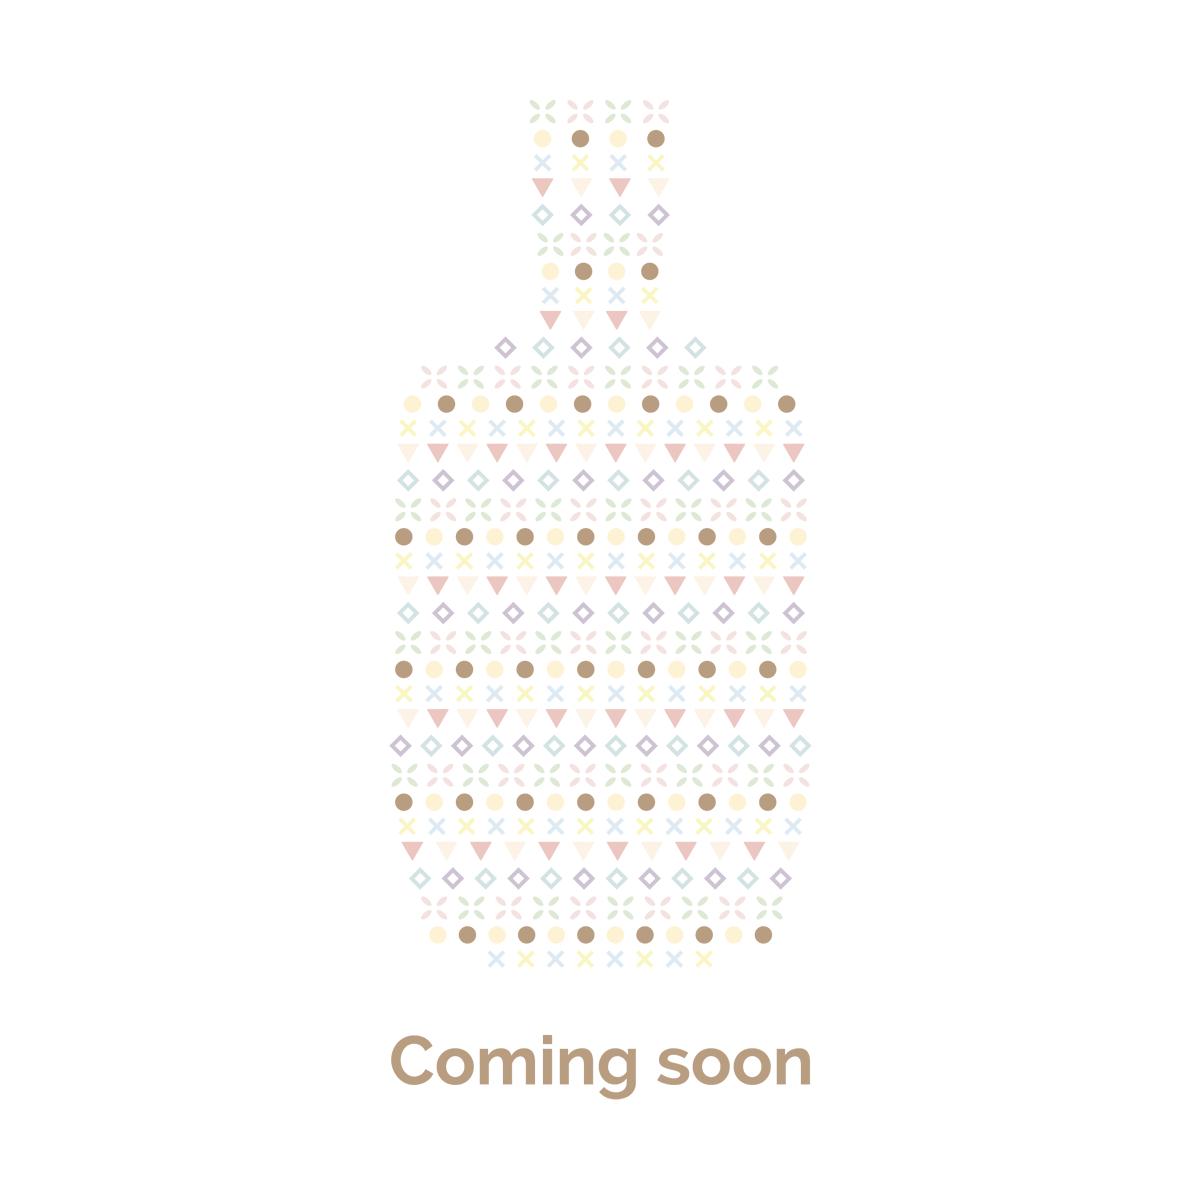 Linea Vermouth - Coming soon.